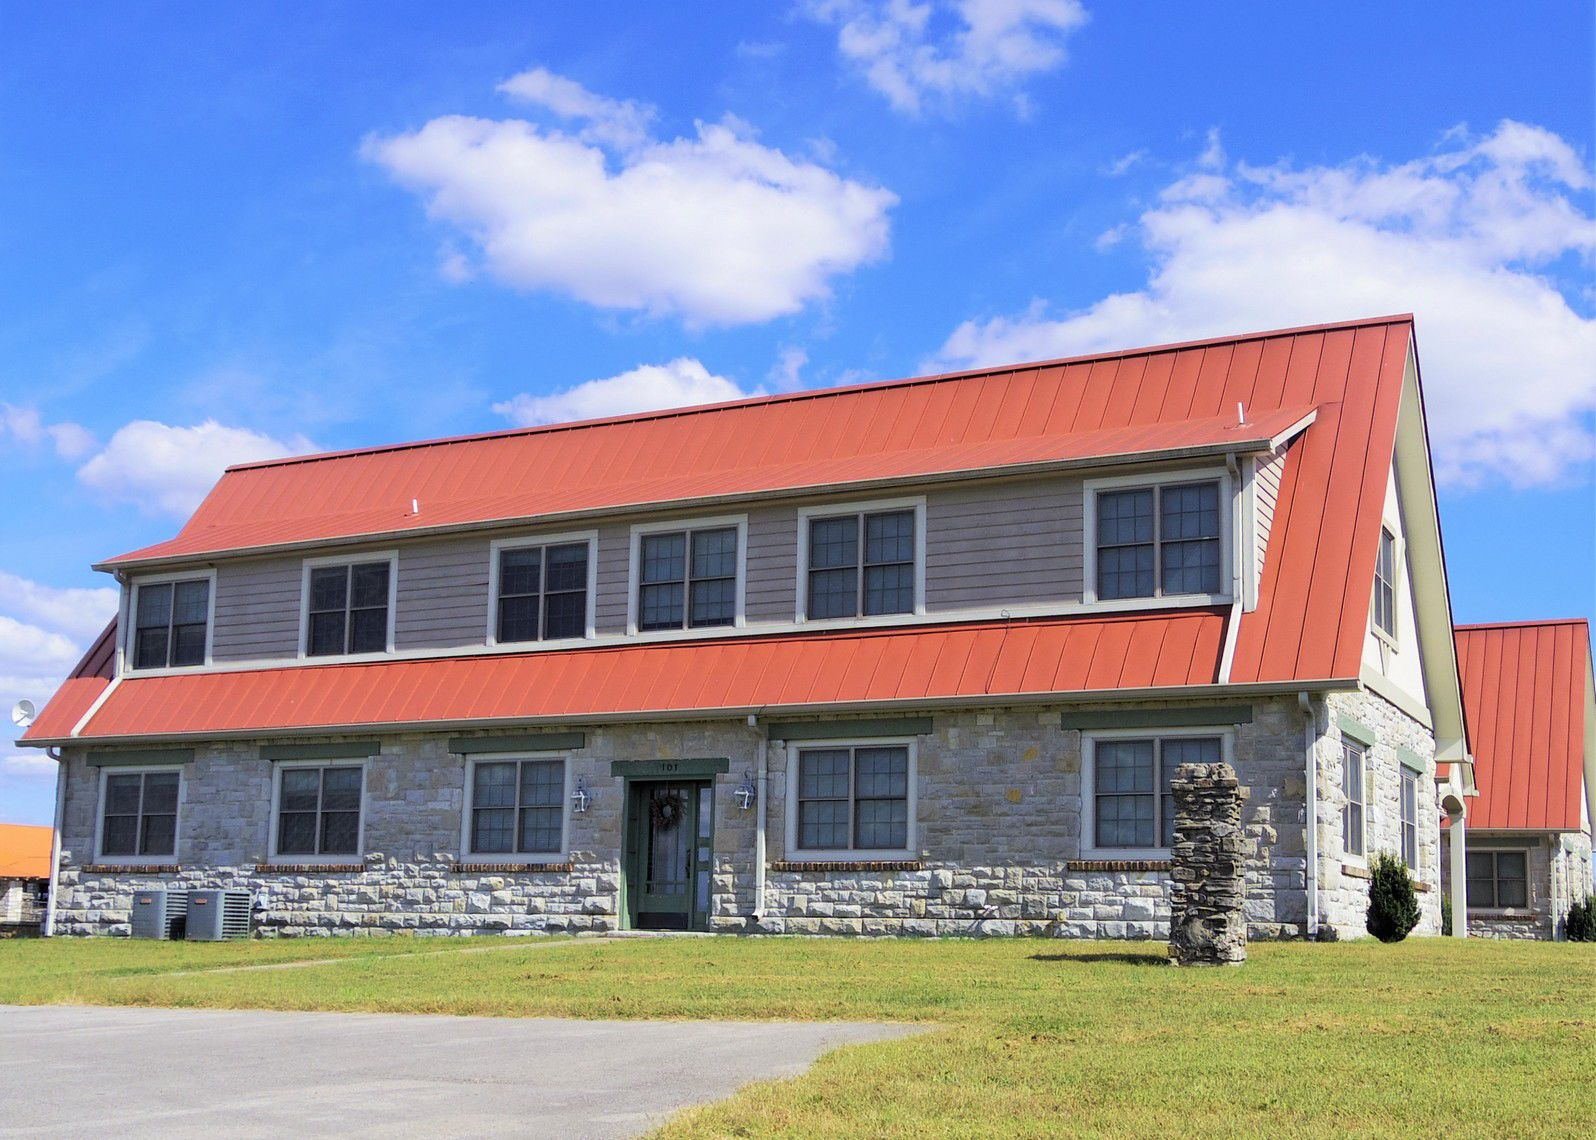 barrett hunter homes featured in 2017 home tour local rh elkvalleytimes com